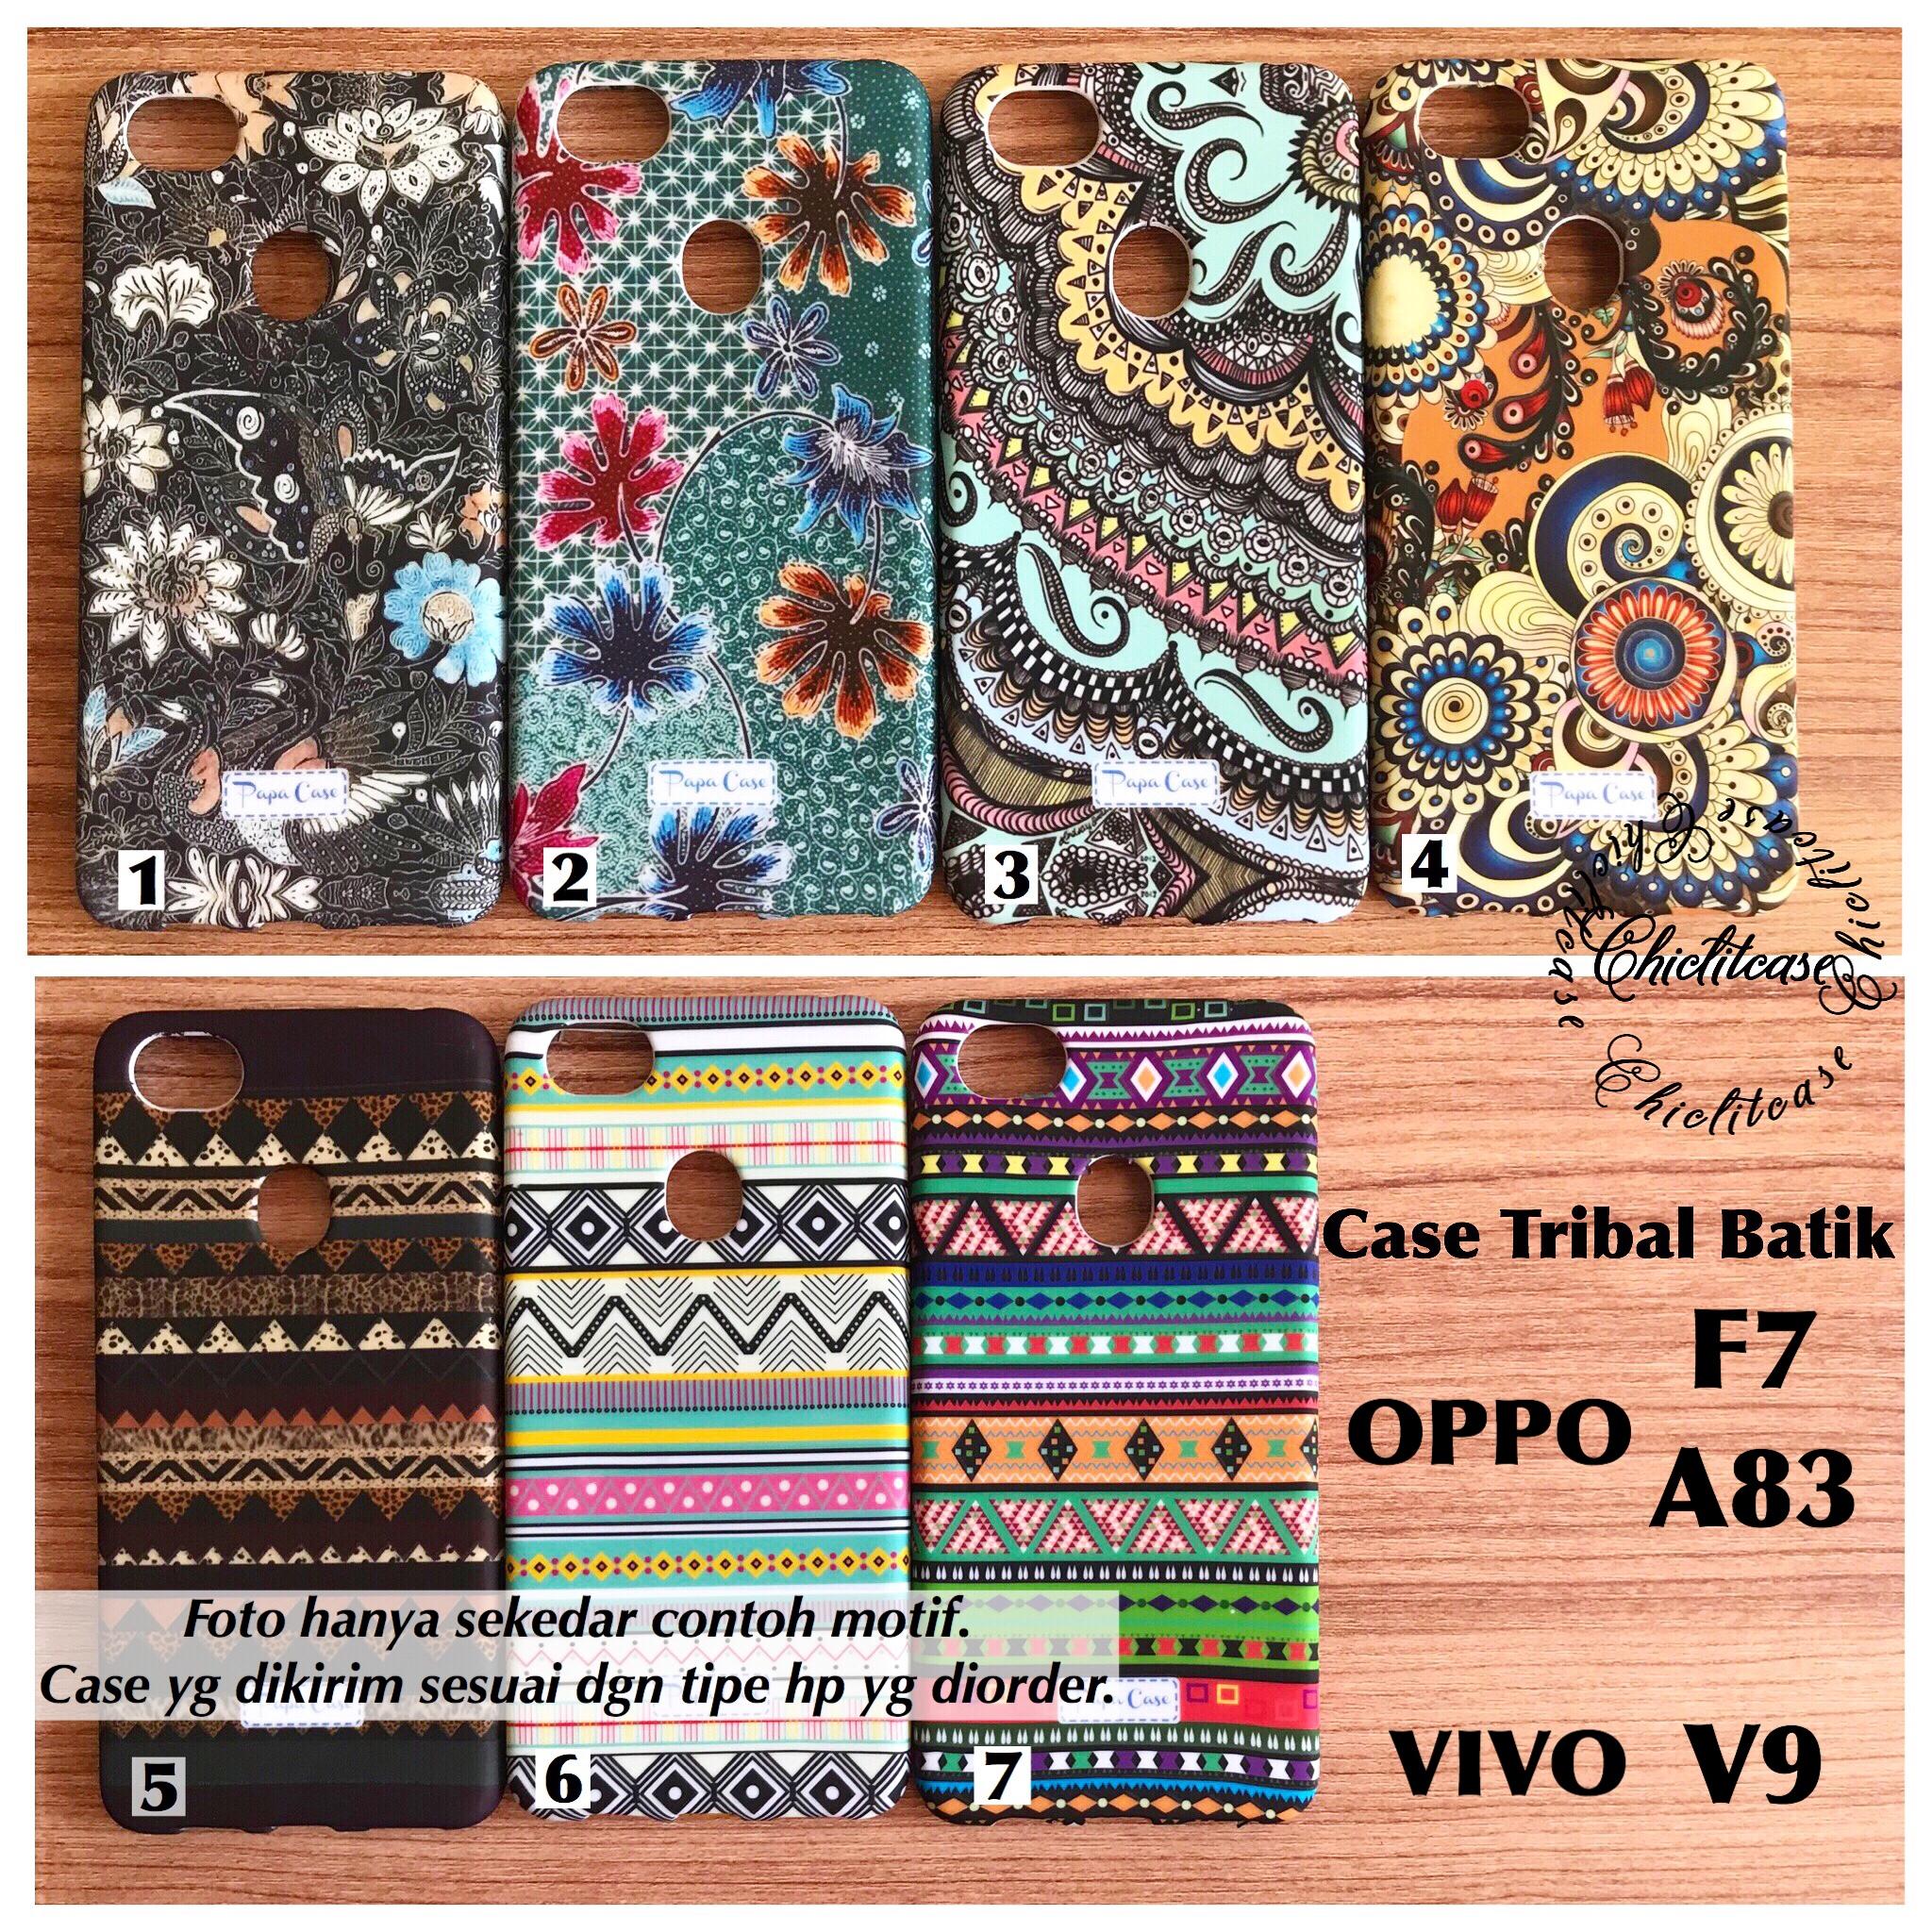 Jual Softcase Tribal Batik Oppo F7 A83 case Vivo V9 glow MURAH chic lit case